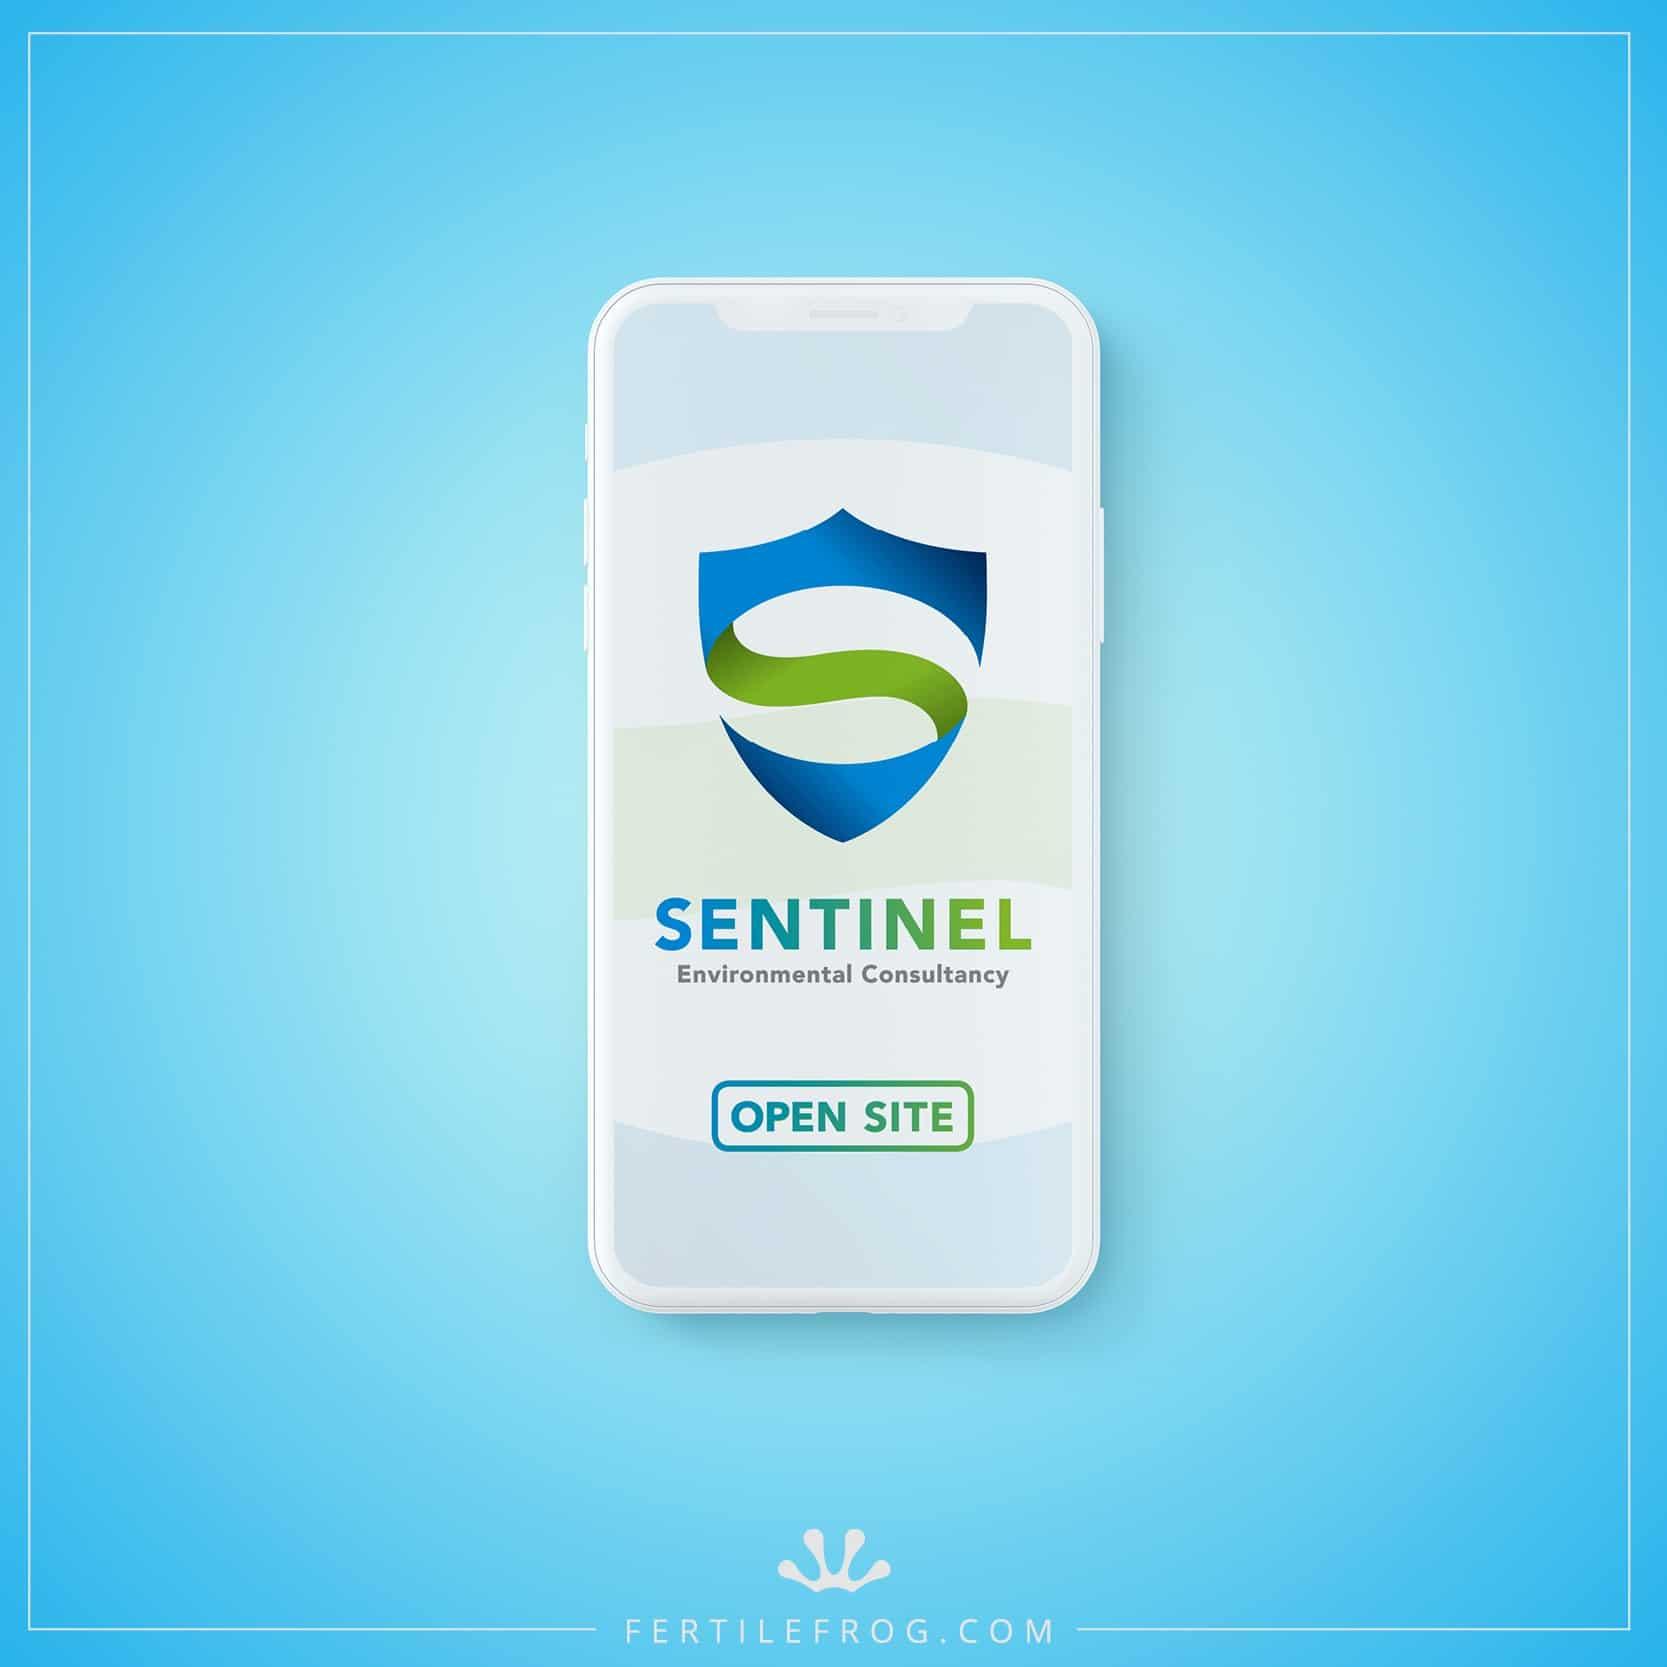 Sentinel website on Iphone X